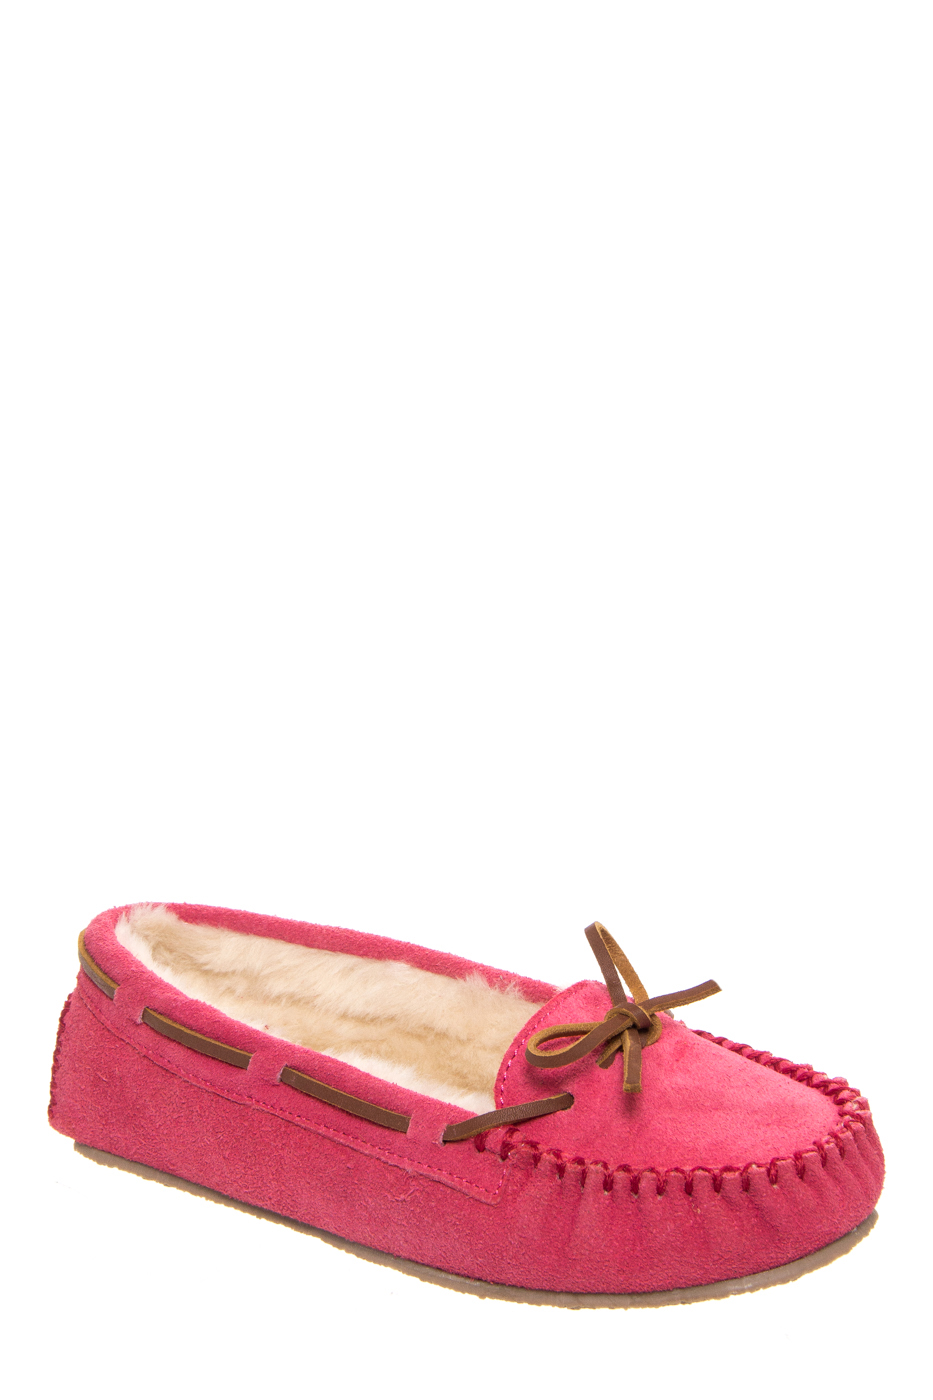 Minnetonka Cally Slipper Moccasins - Hot Pink